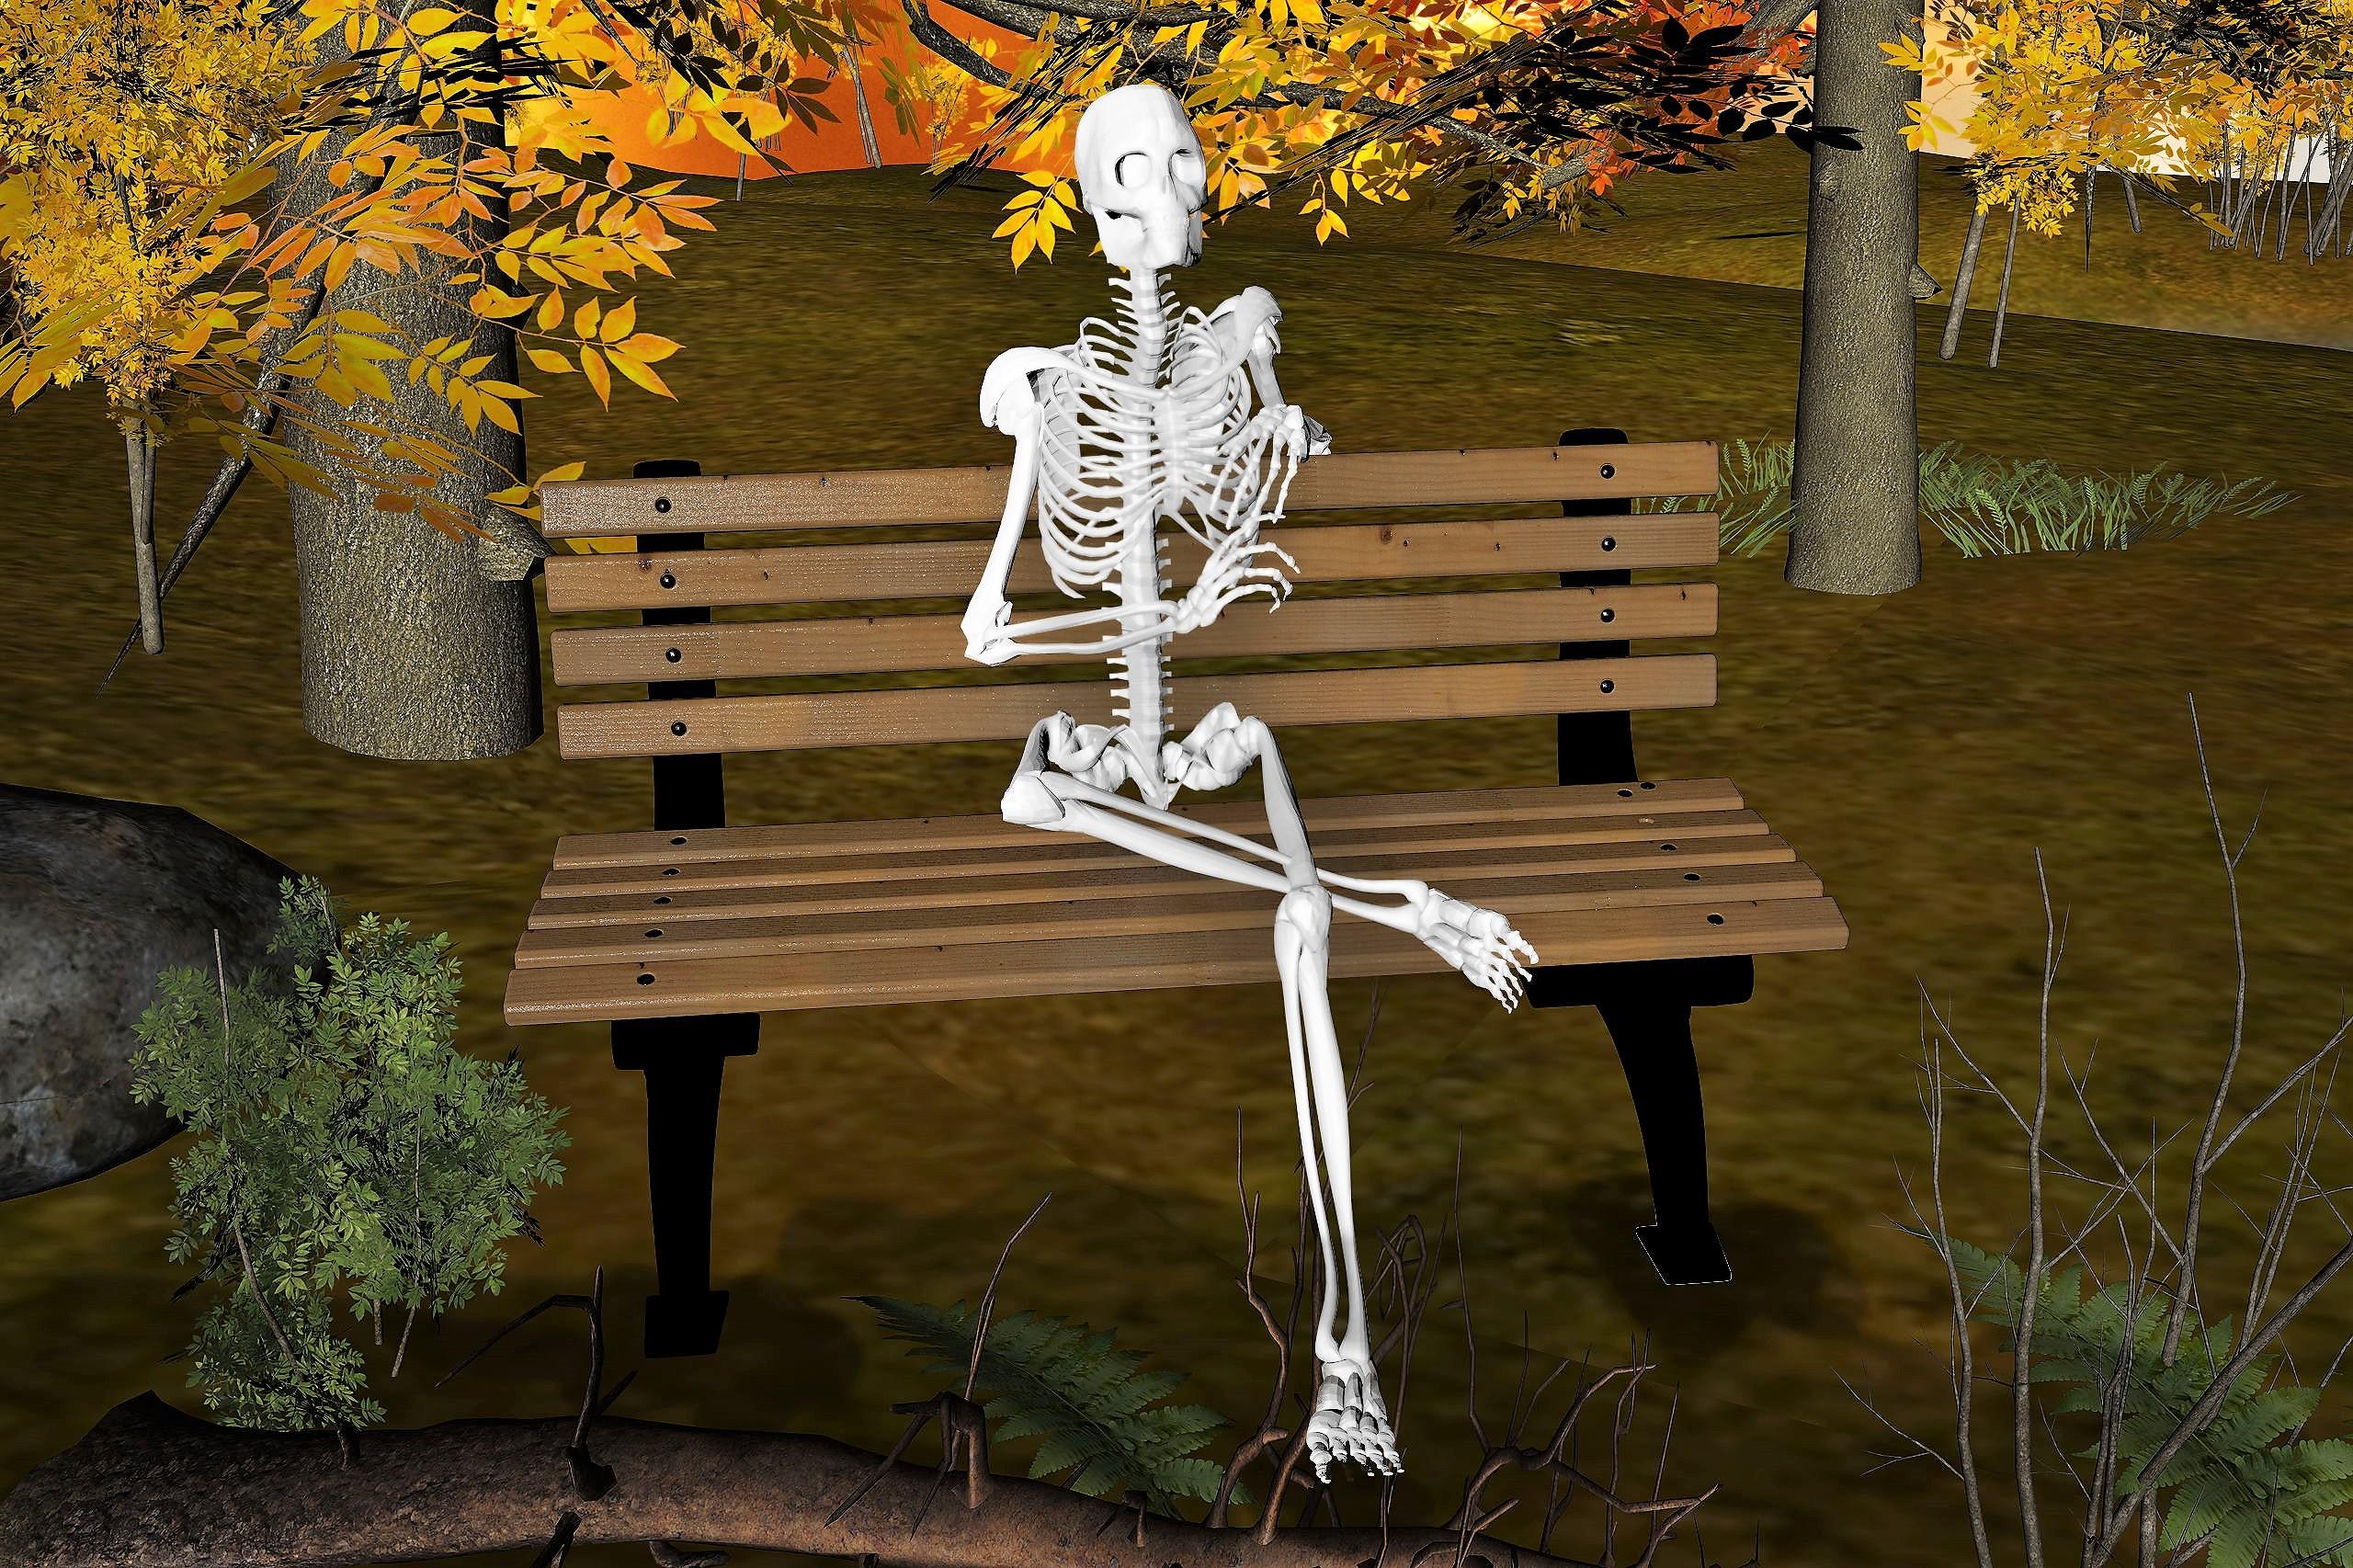 Skeleton Sitting on Bench, Mysterious, Skeleton, Surreal, 3drender, HQ Photo